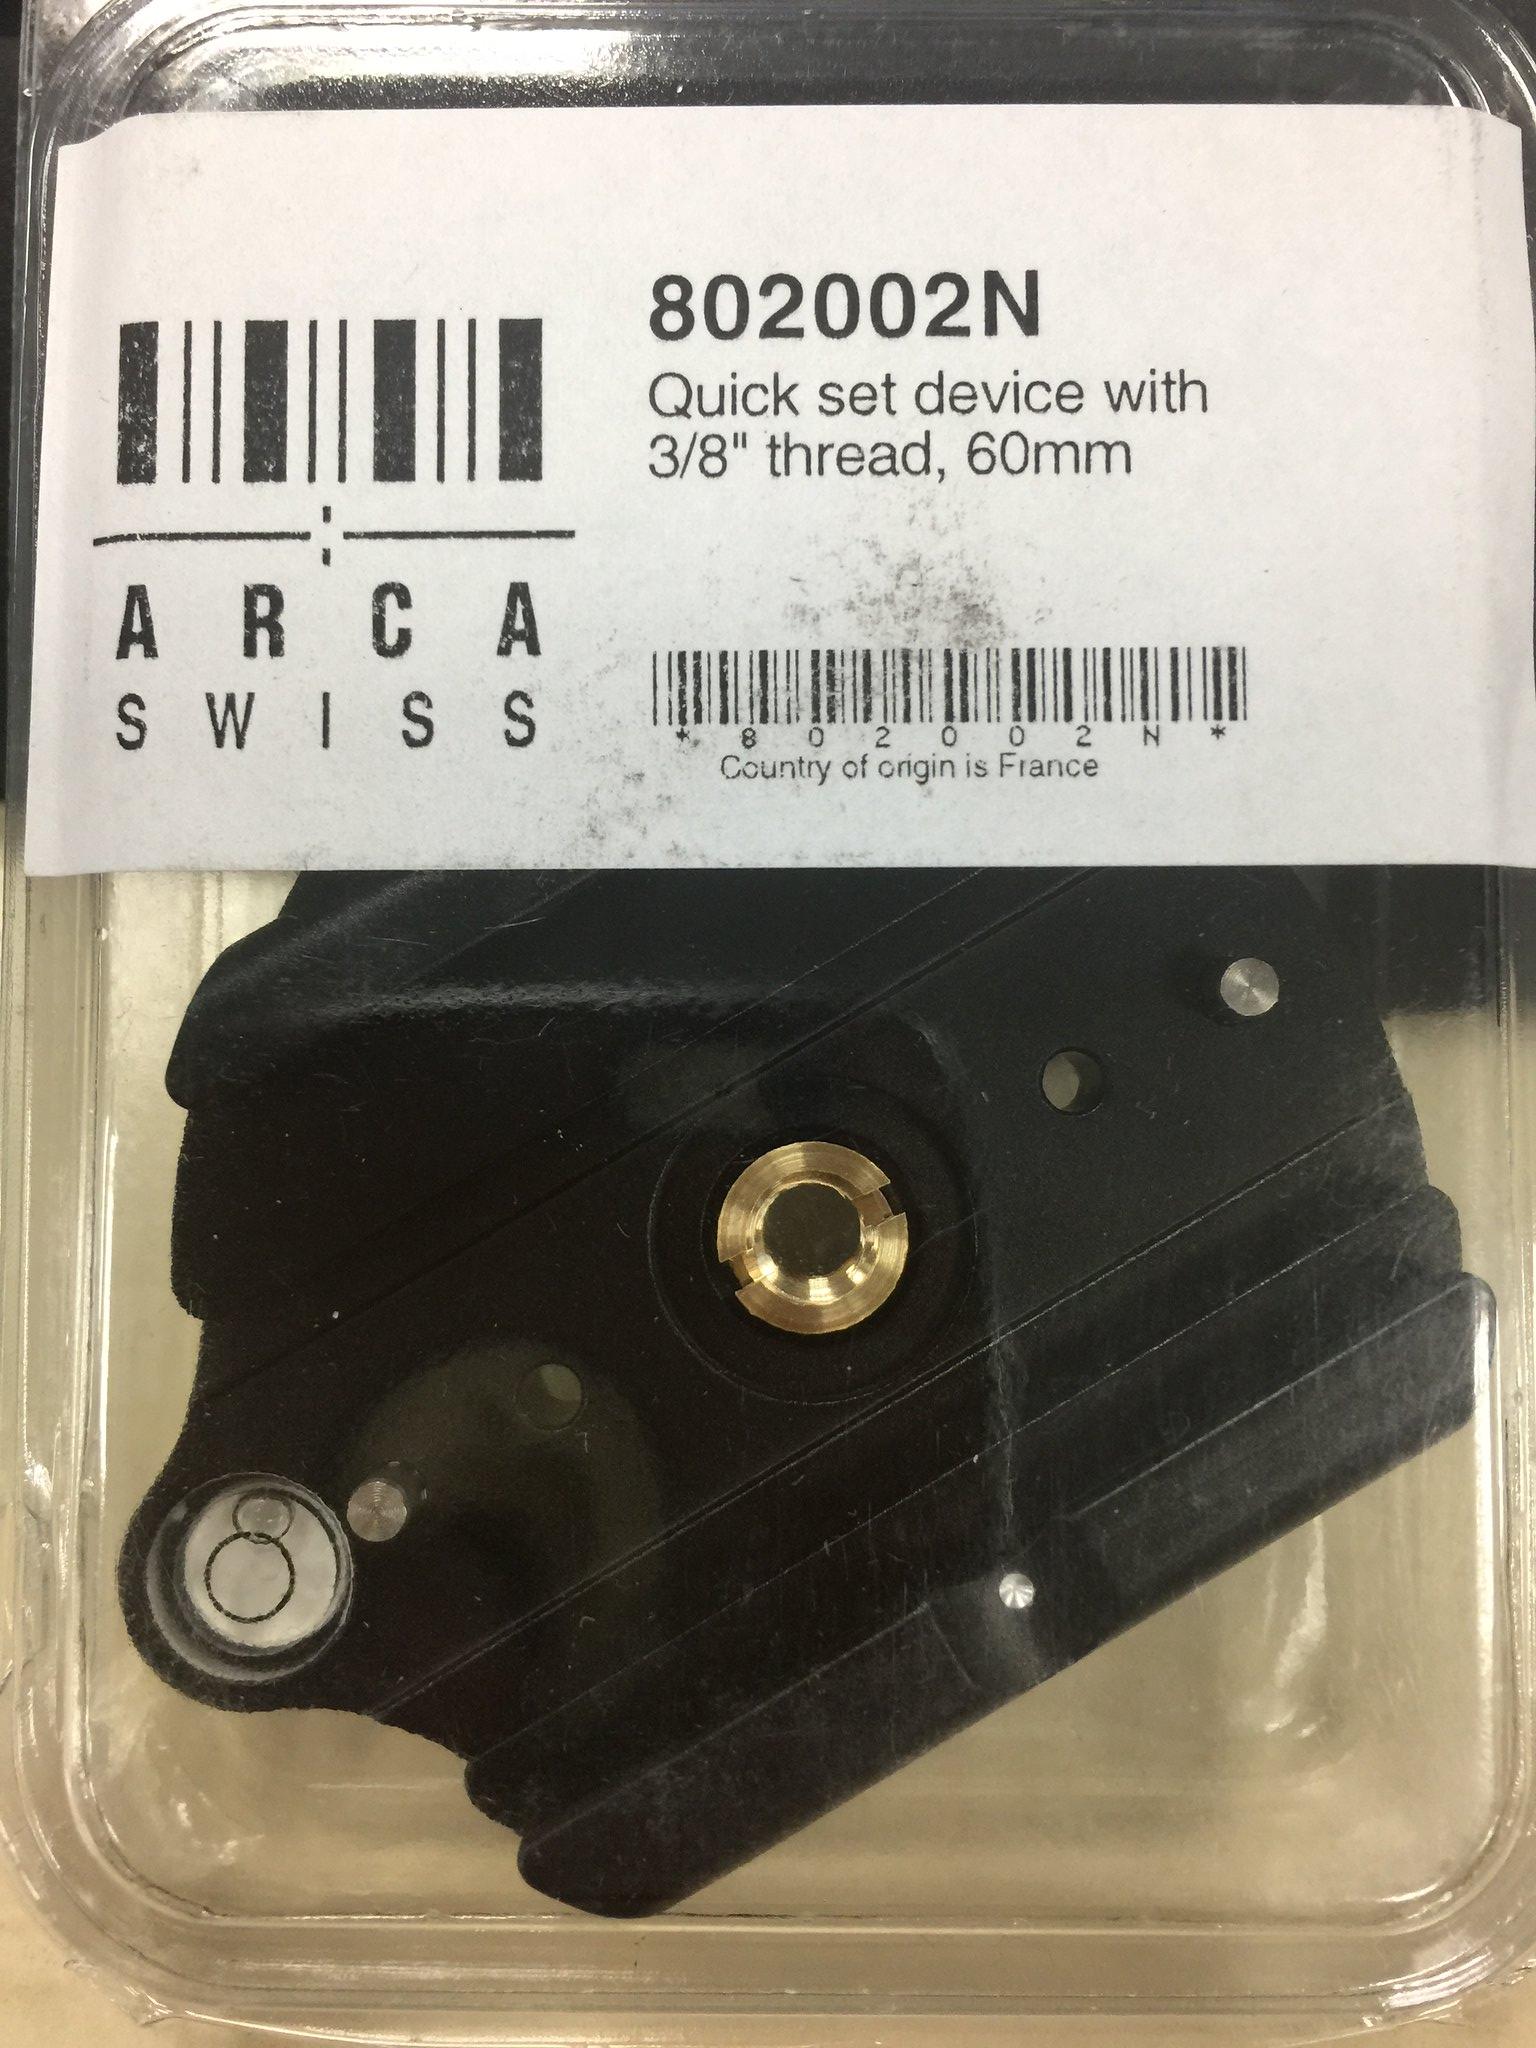 Arca-Swiss Quick Release Clamp